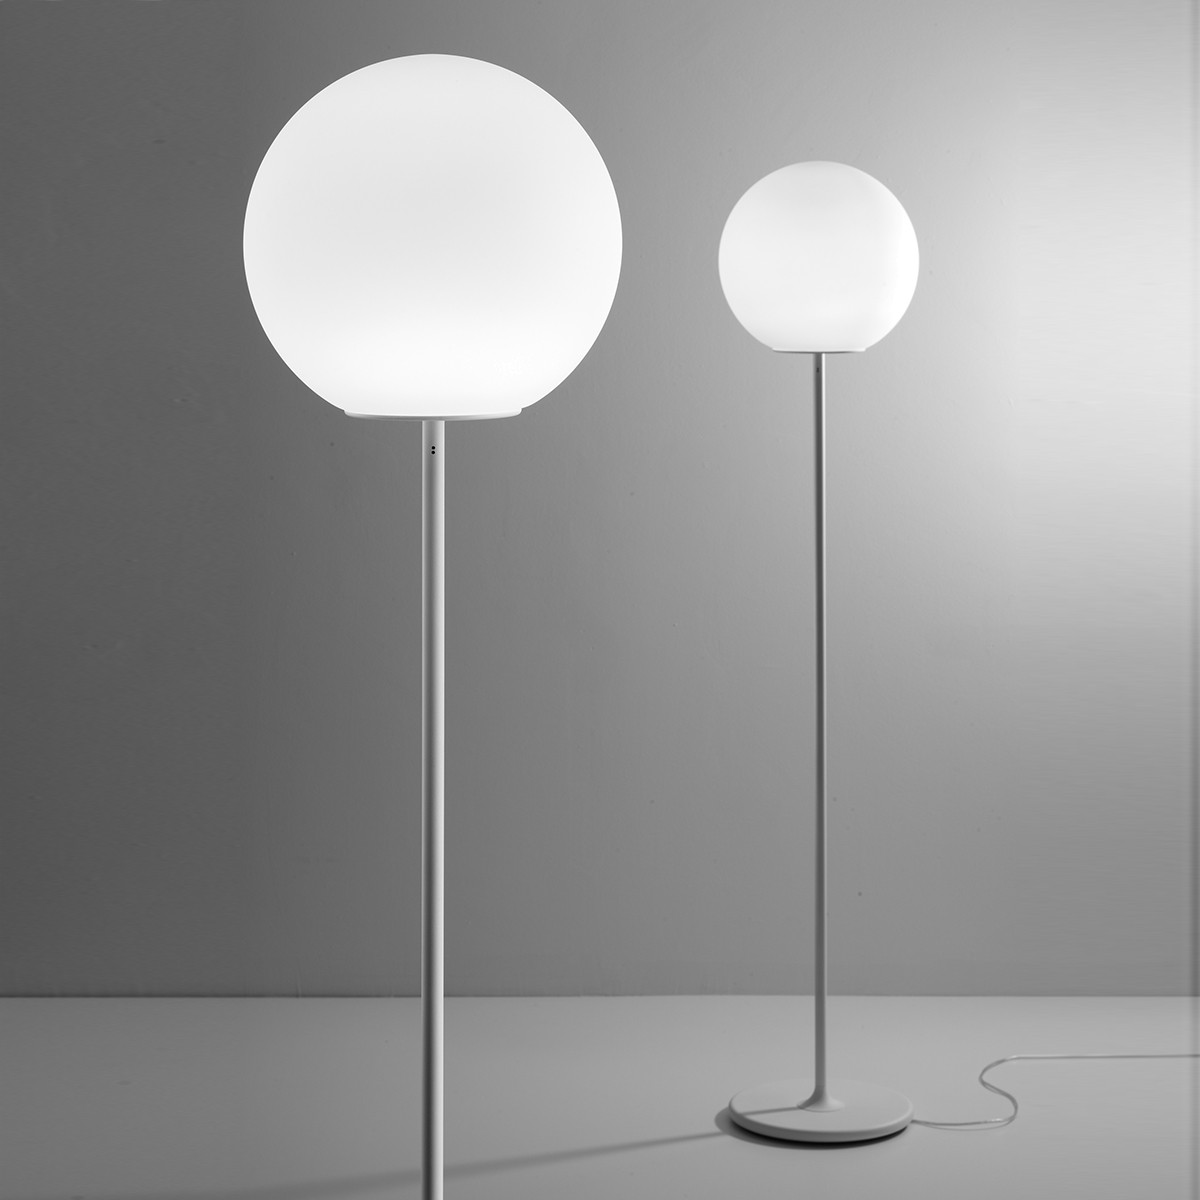 Fabbian Lumi Sfera Stehleuchte, weiß, Ø: 35 cm